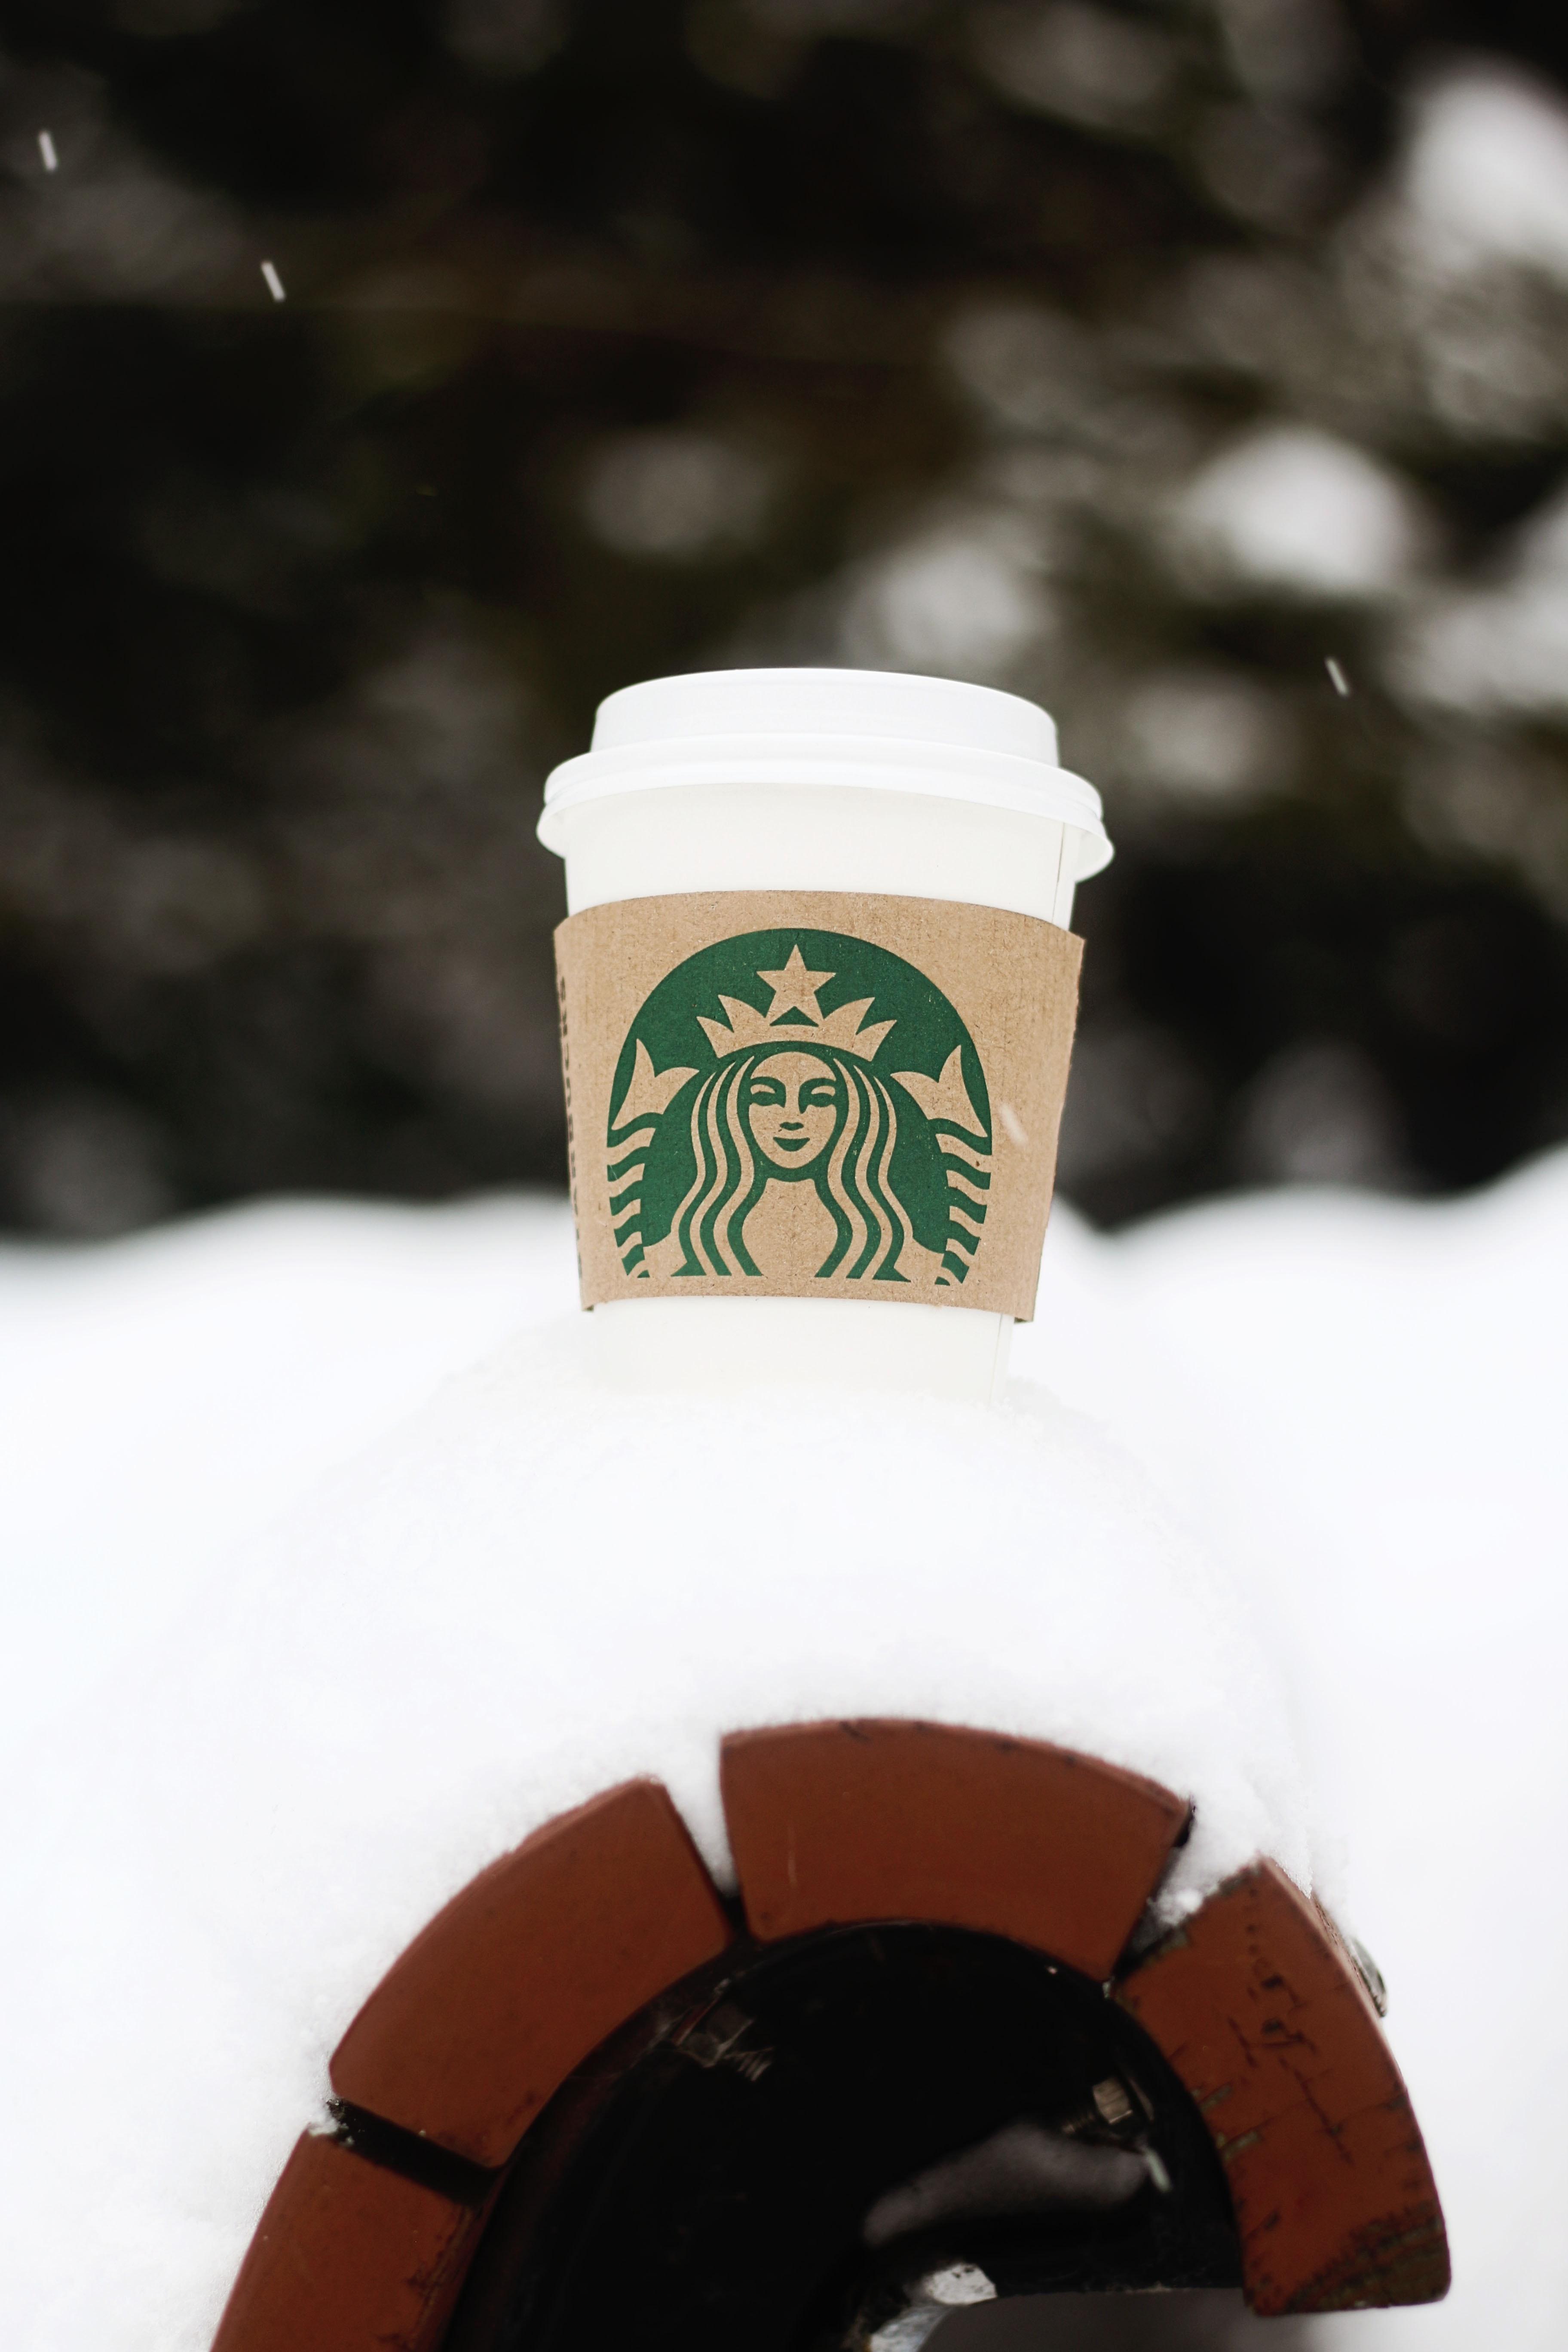 Starbucks hot coffee cup photo